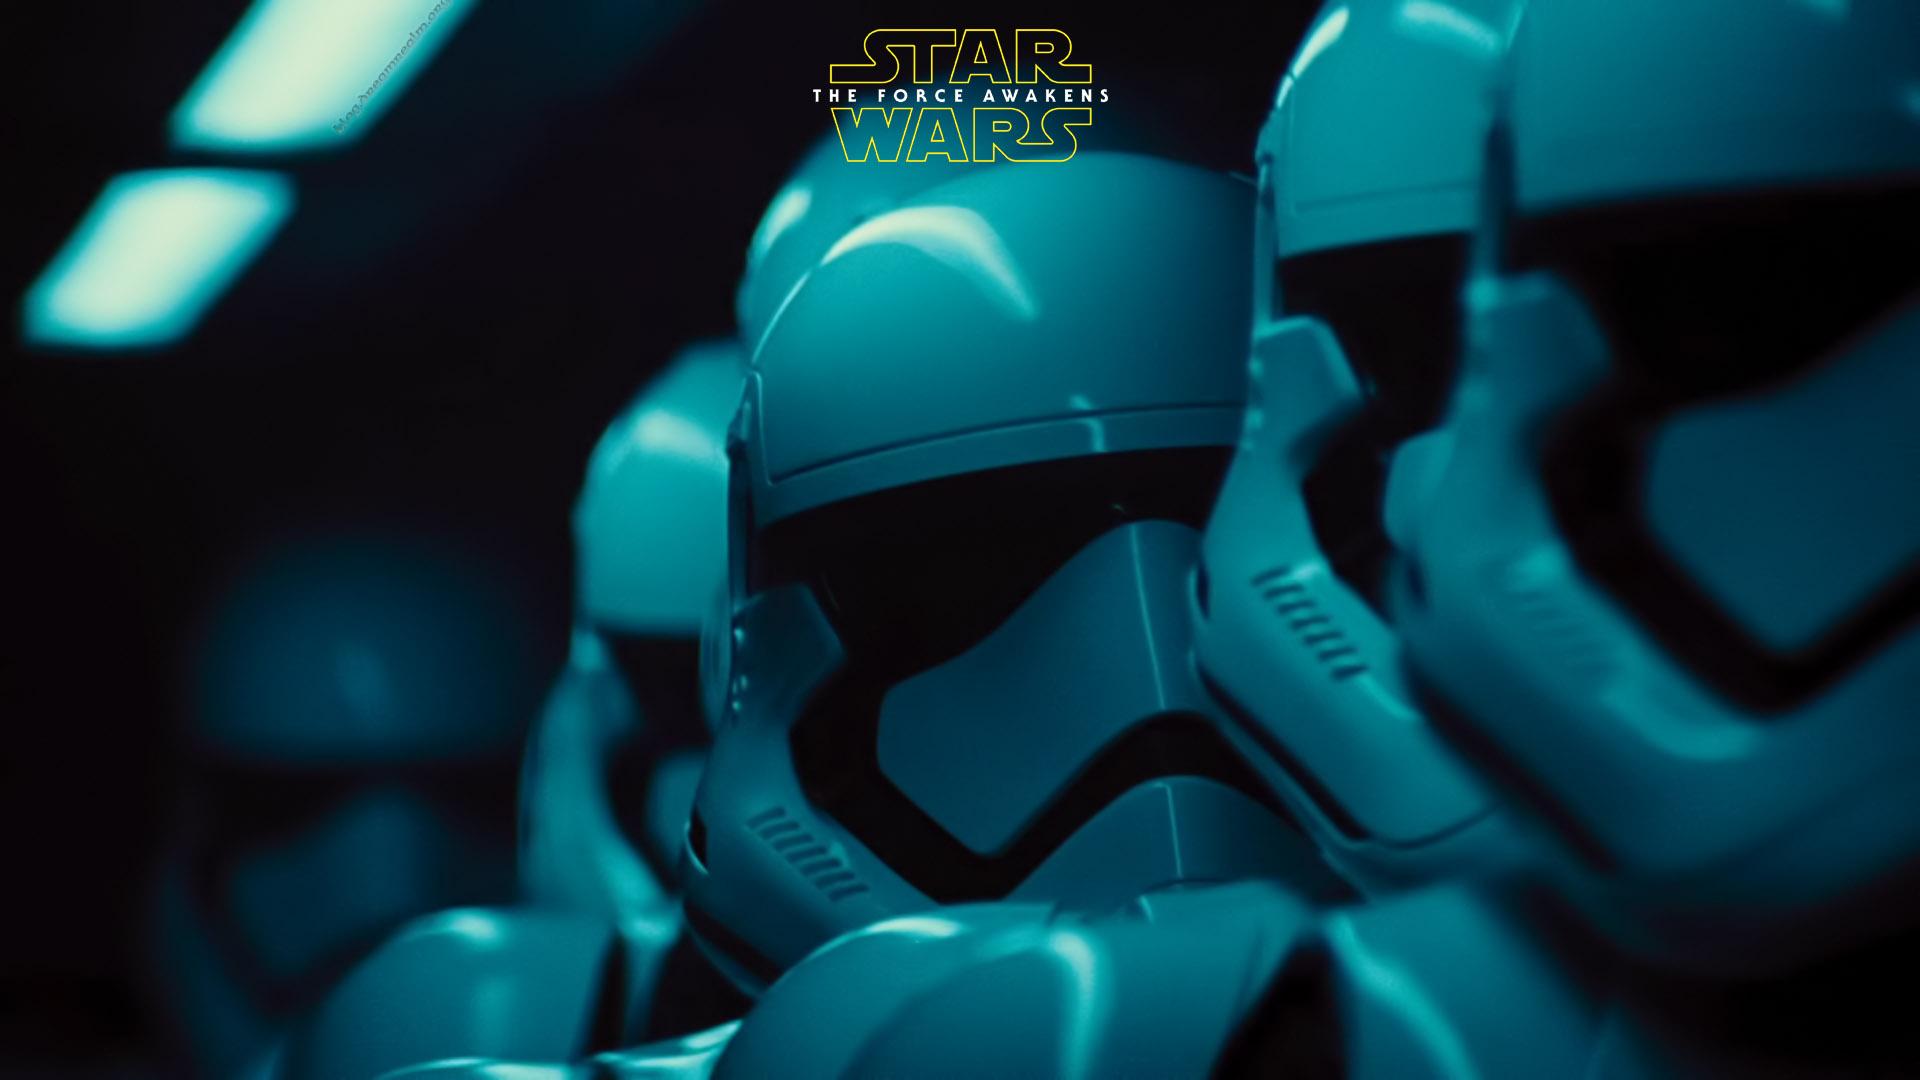 Star Wars Episode7 Troopers 1920x1080 blogdreamrealmorg 1920x1080